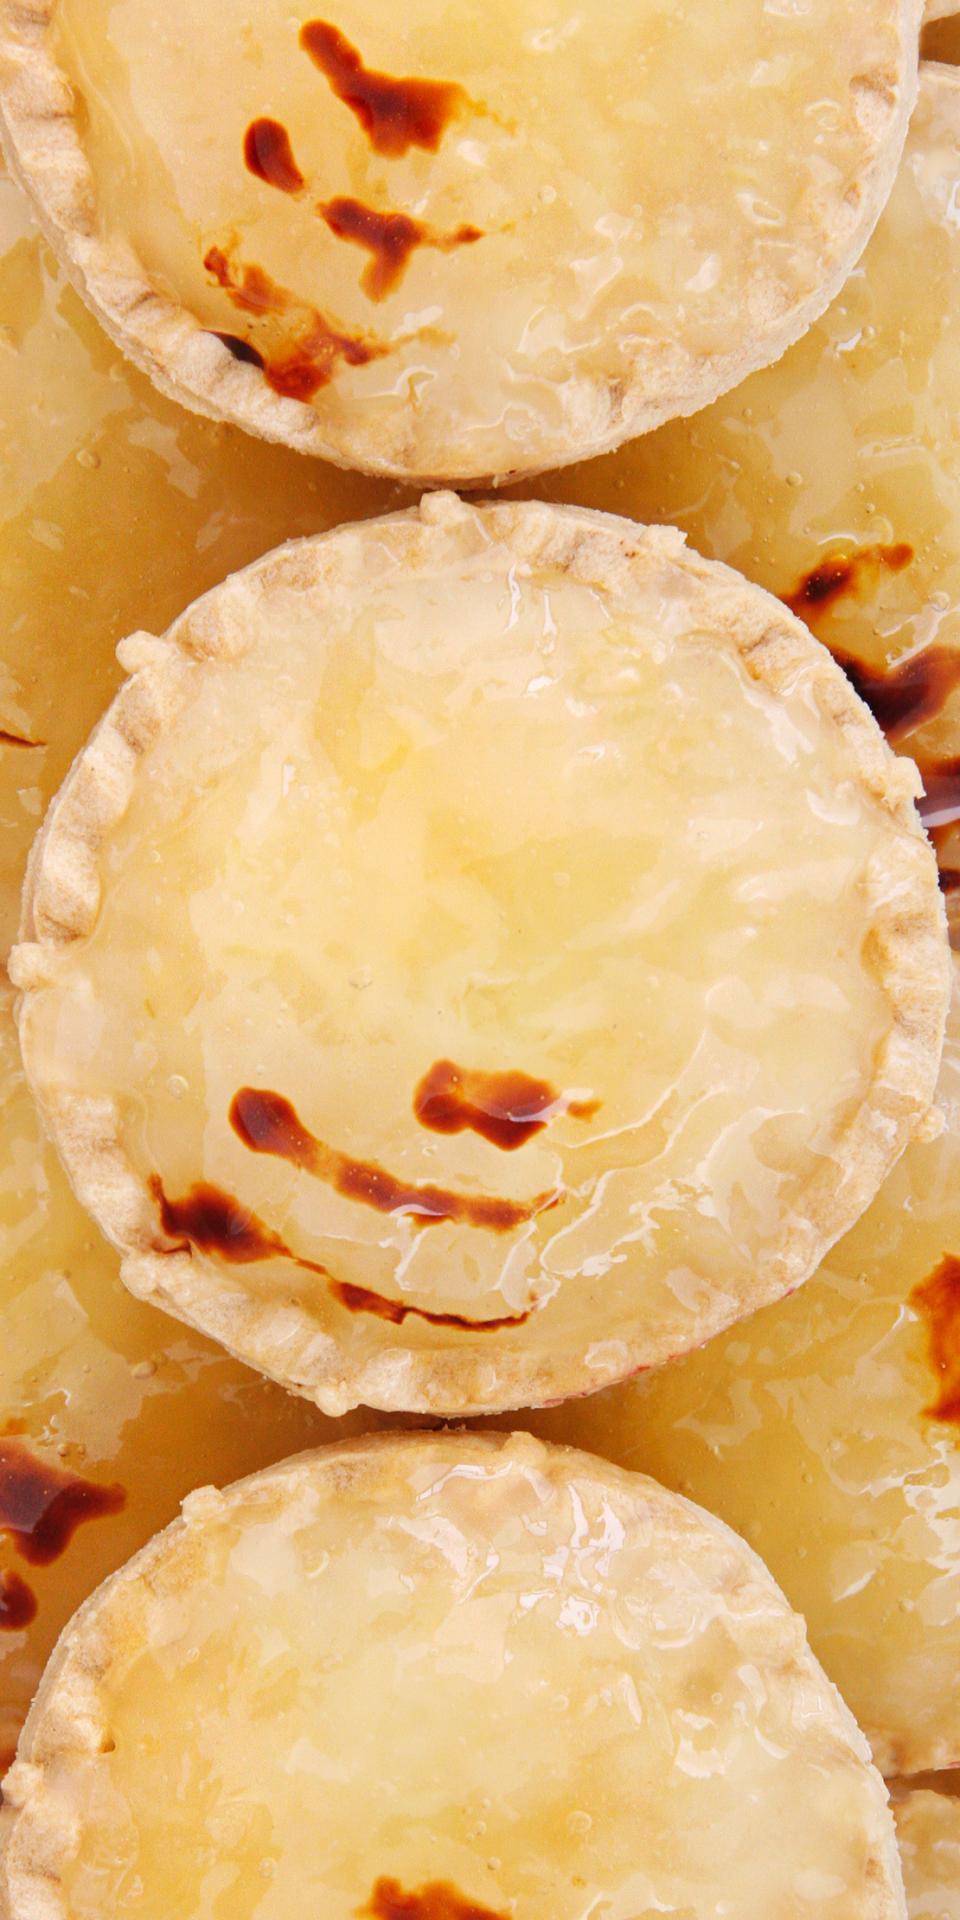 Tartaleta-de-manzana.png